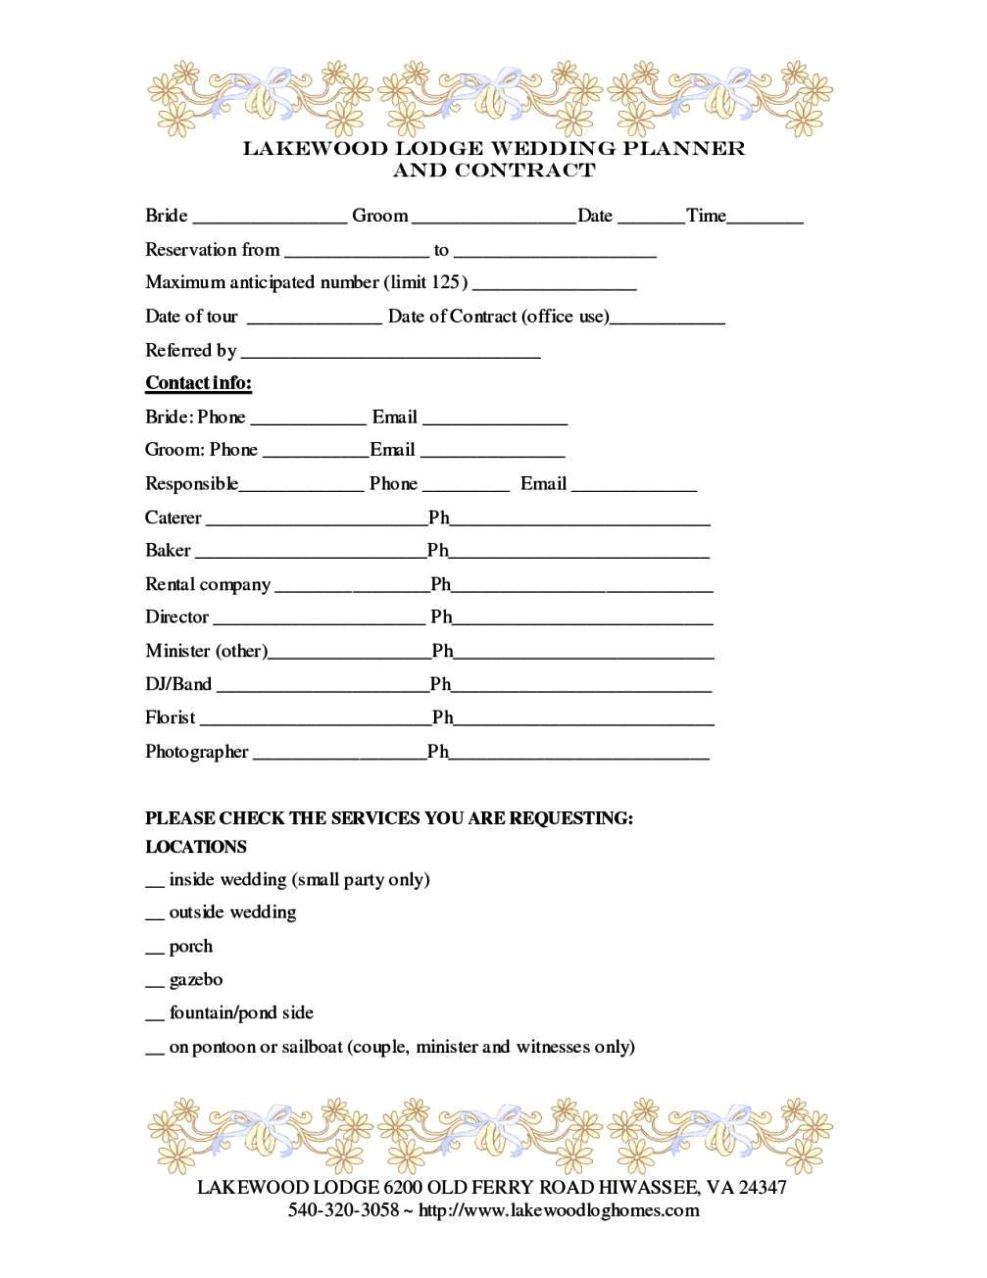 wedding florist contract template